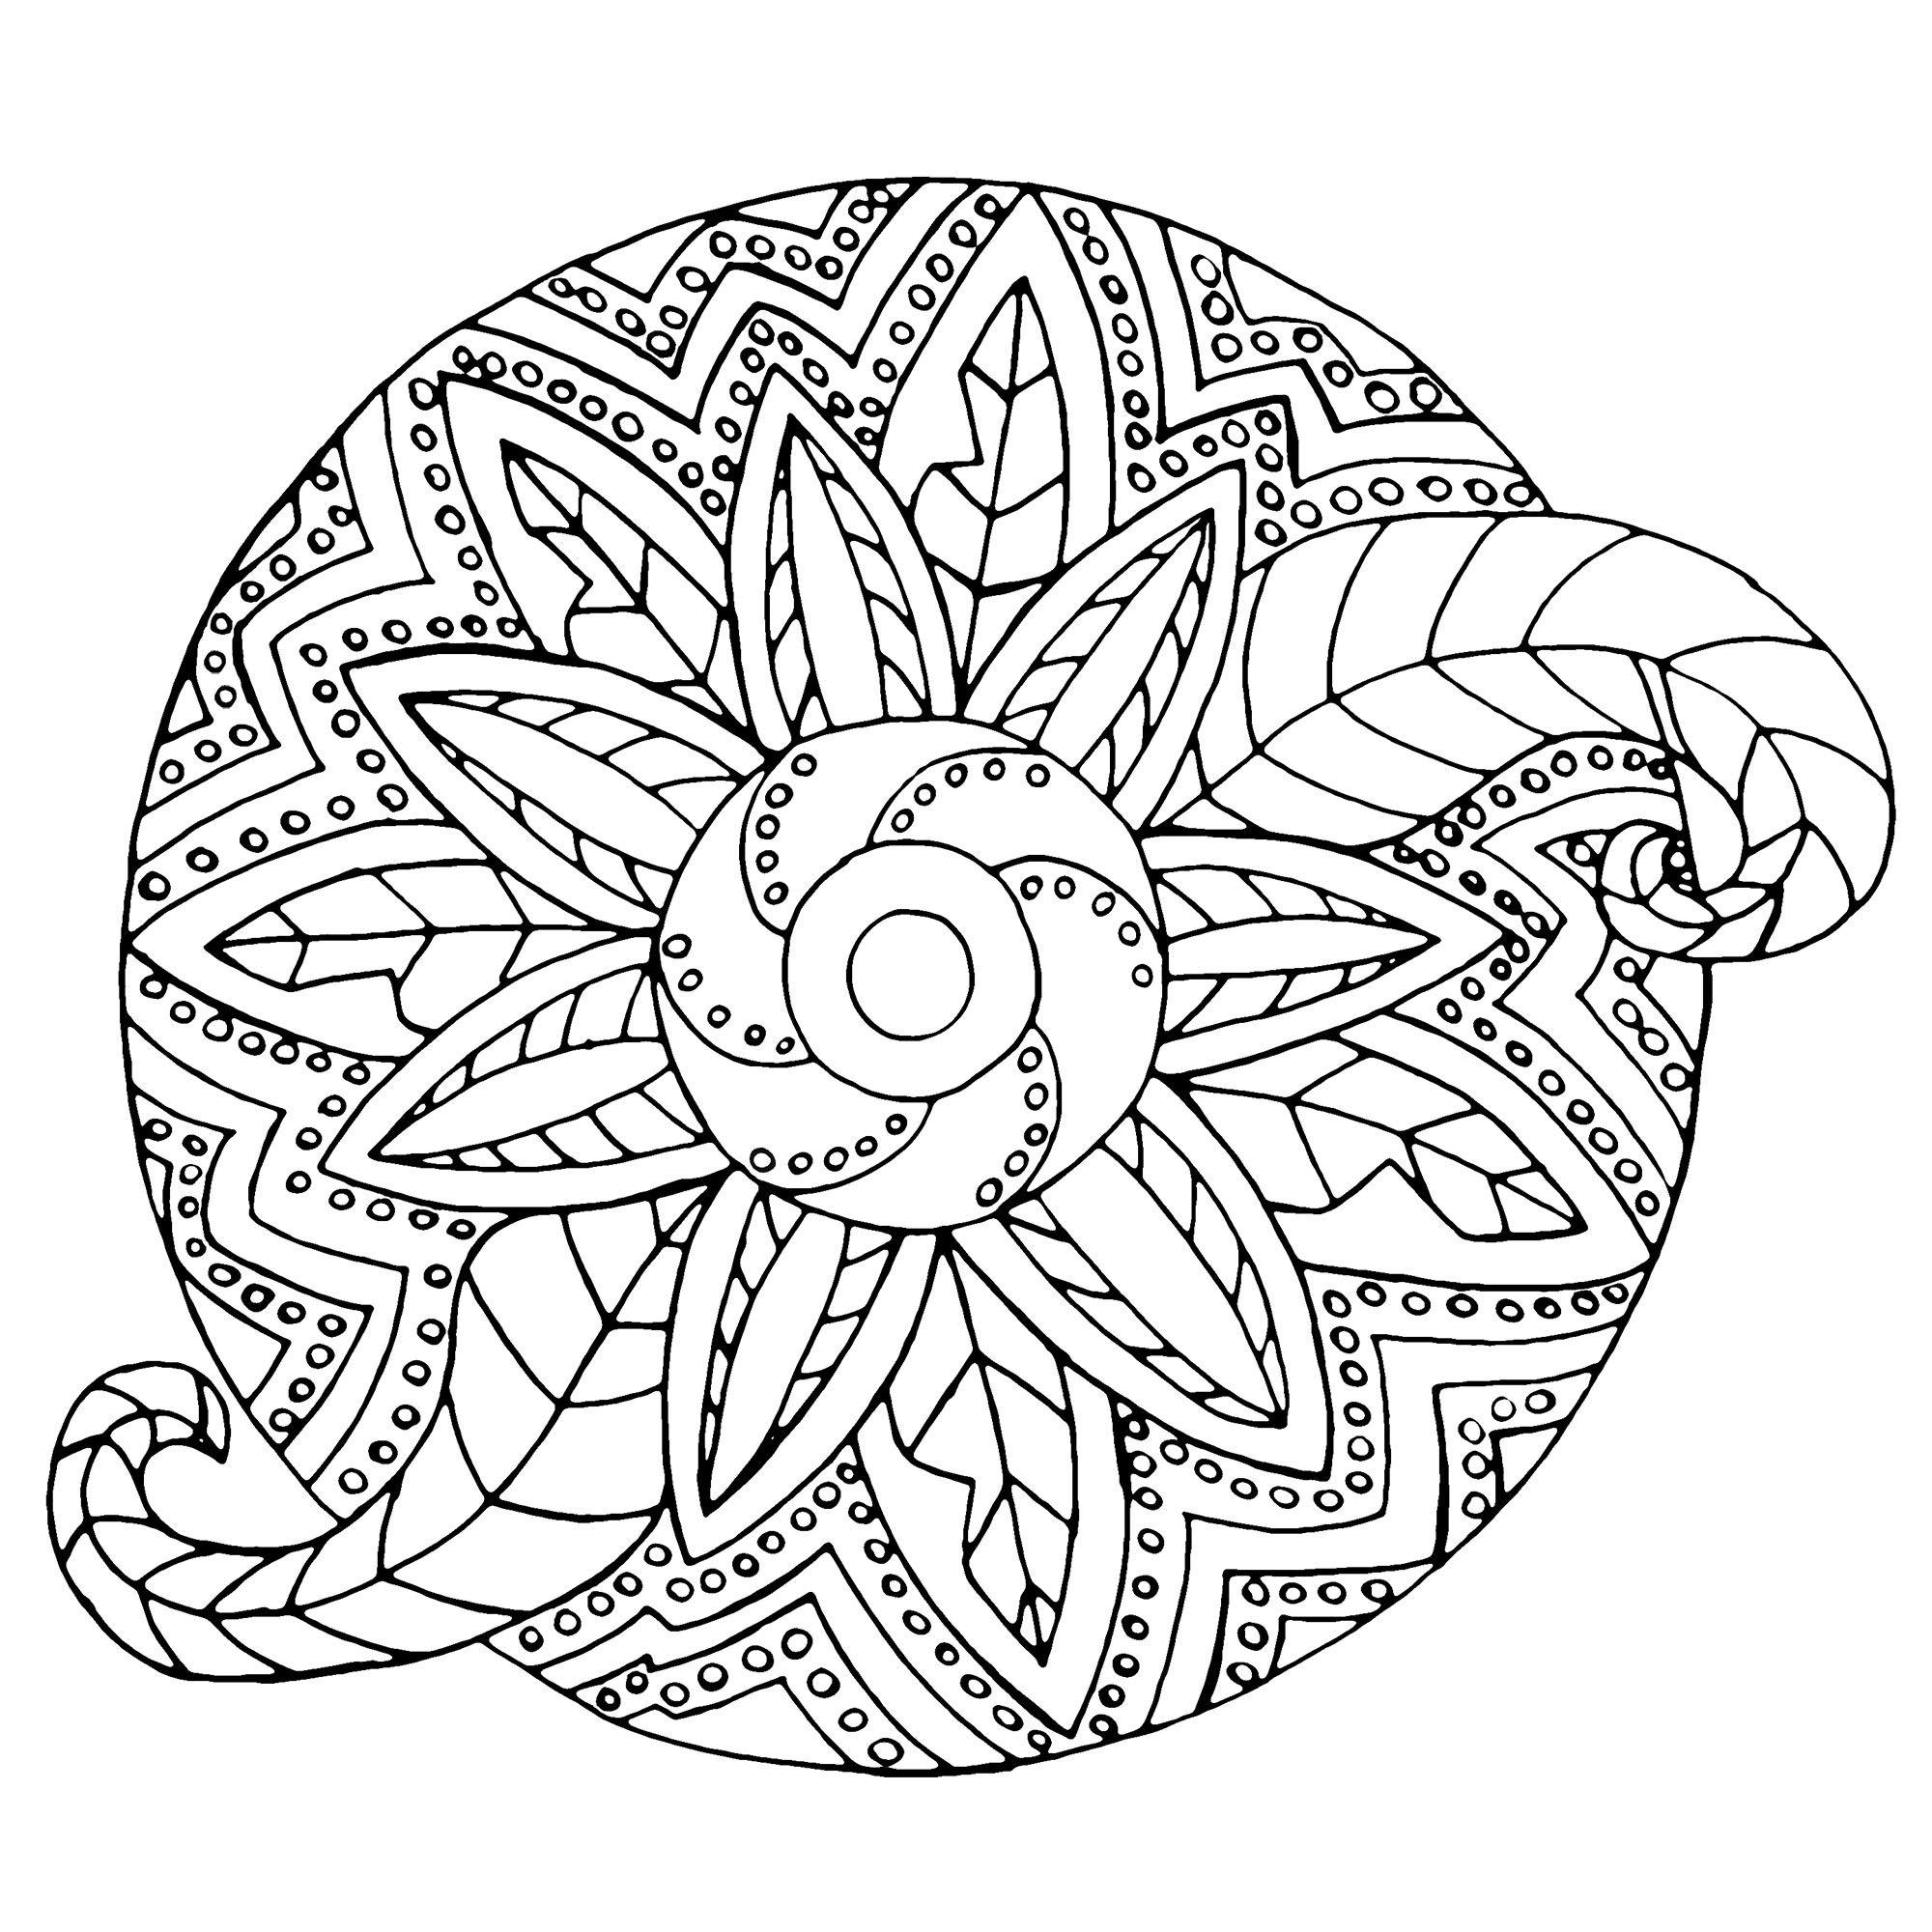 Mandala Metallic Vegetal Mandalas Coloring Pages For Adults